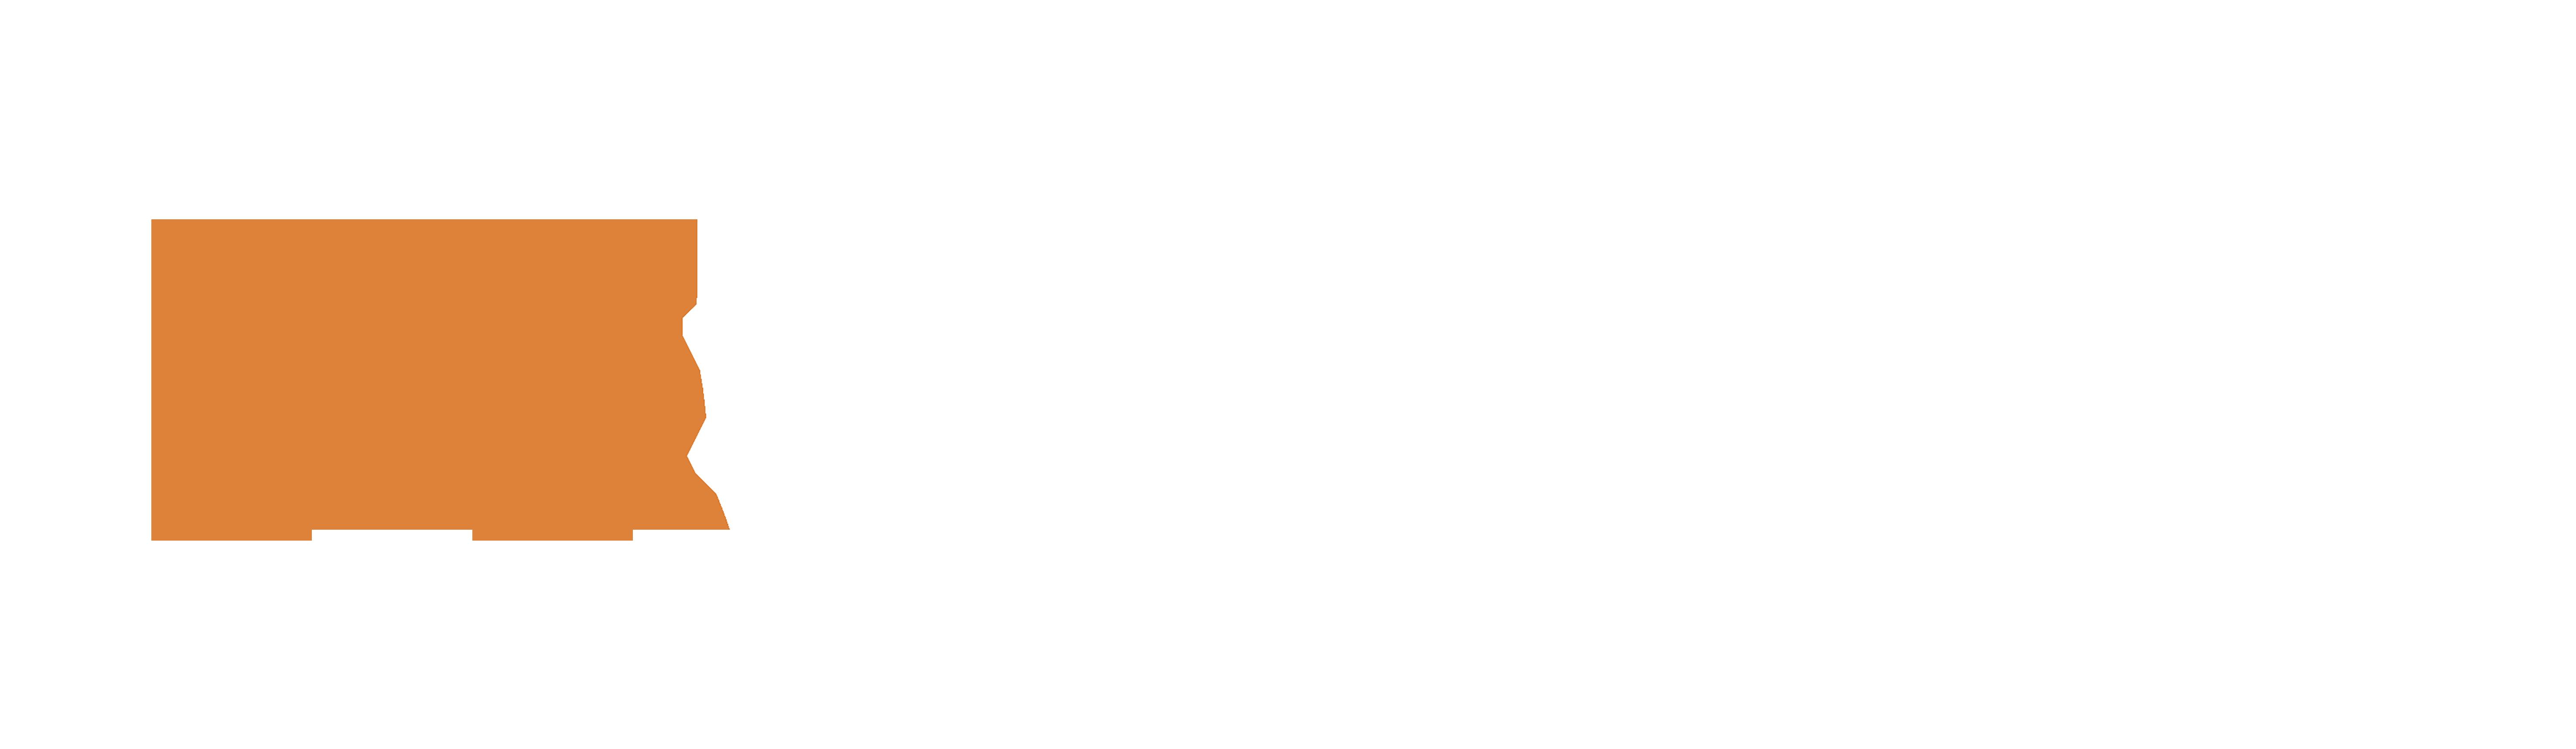 BrighterDay - Regnskab, bogholderi og løn